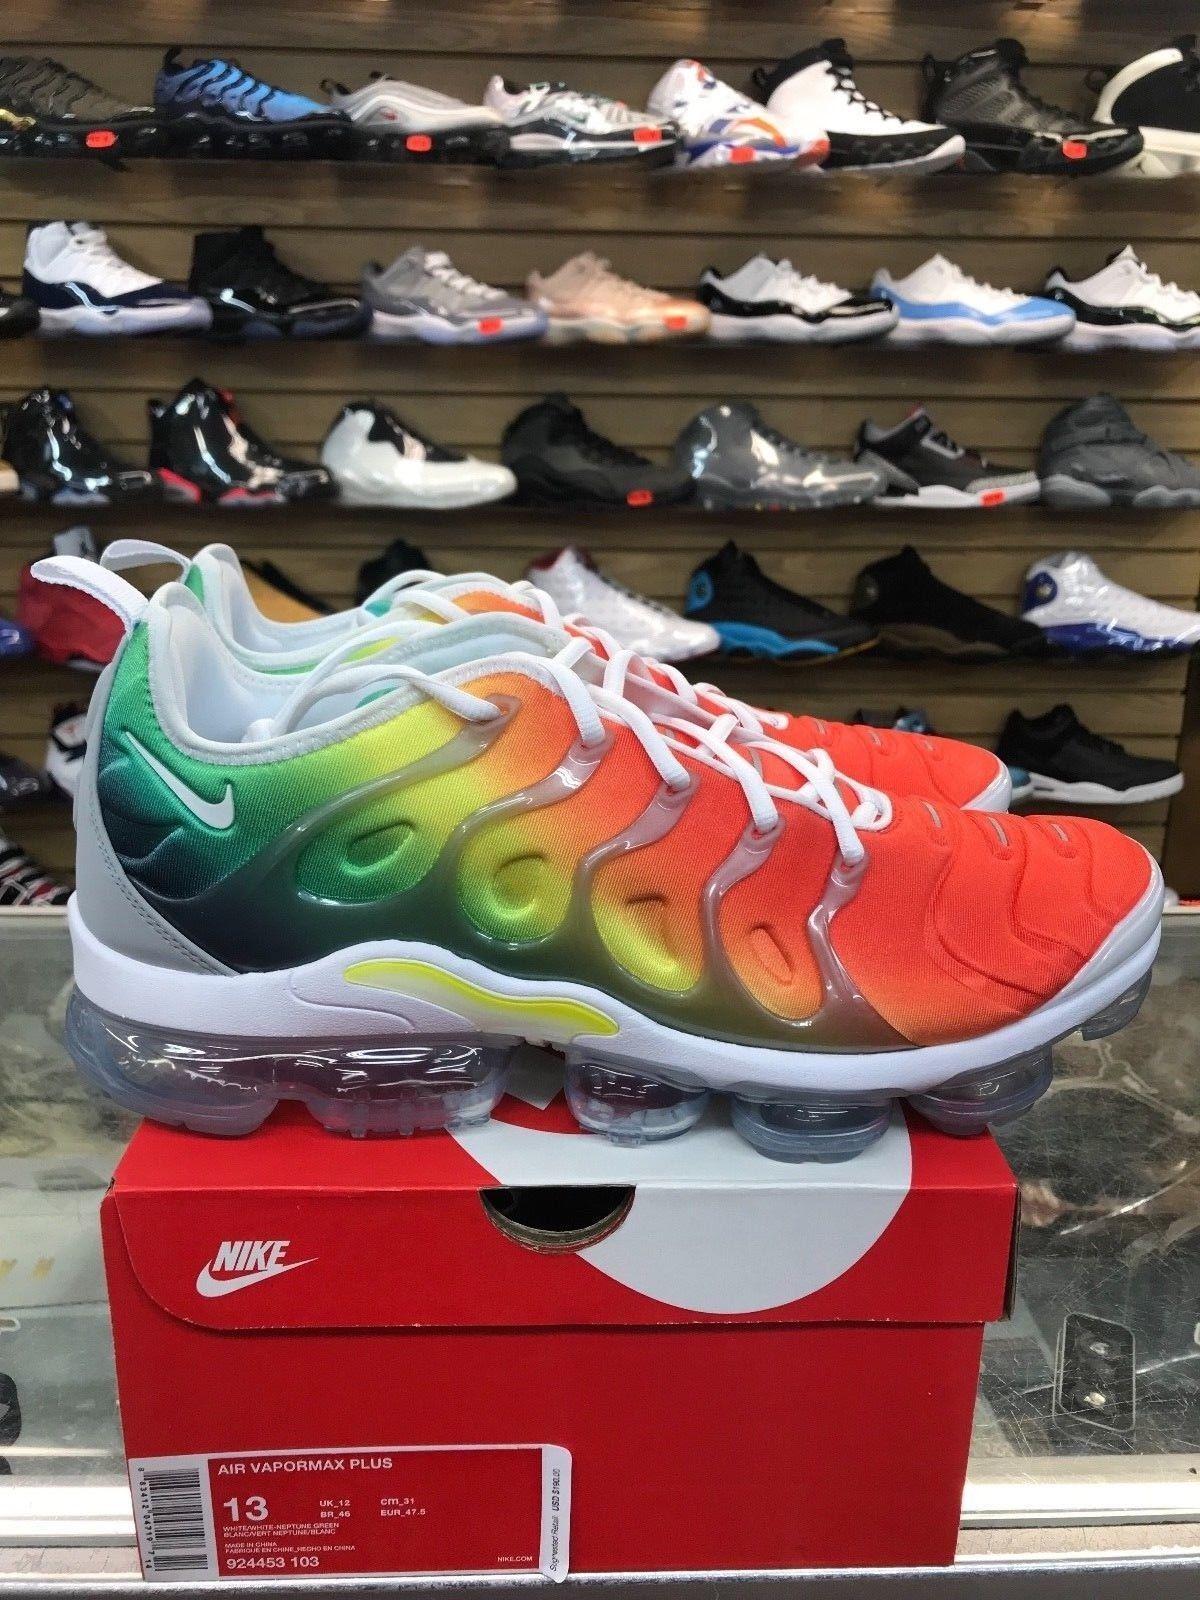 Nike air vapormax piu 'arcobaleno uomini bianchi / nettuno green924453-103 autentico